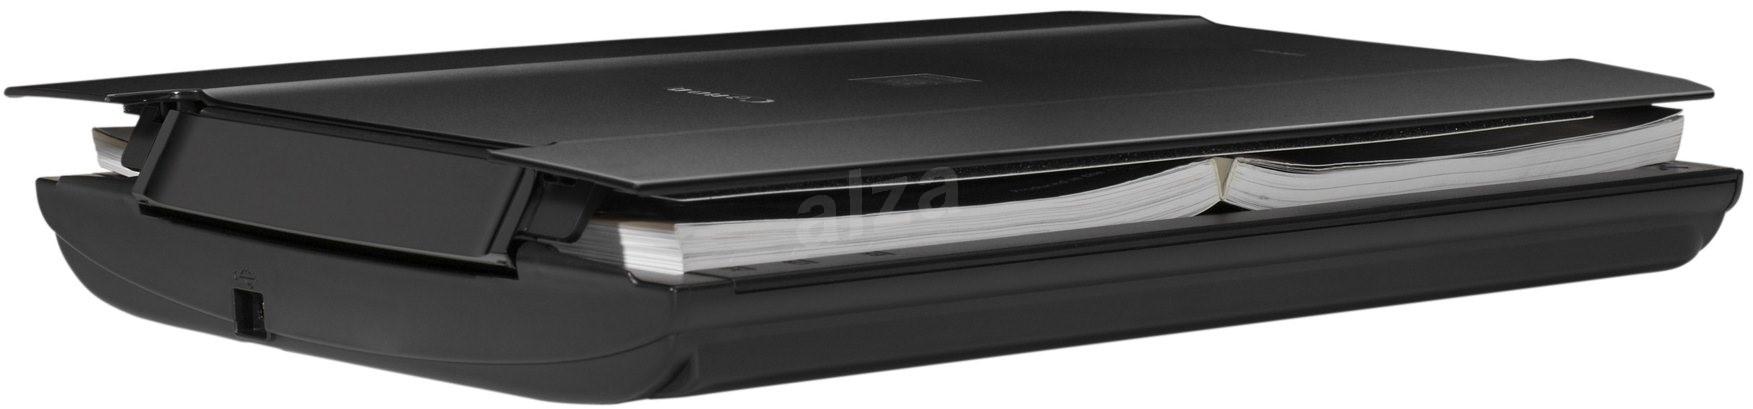 scanner canon lide 110 pdf